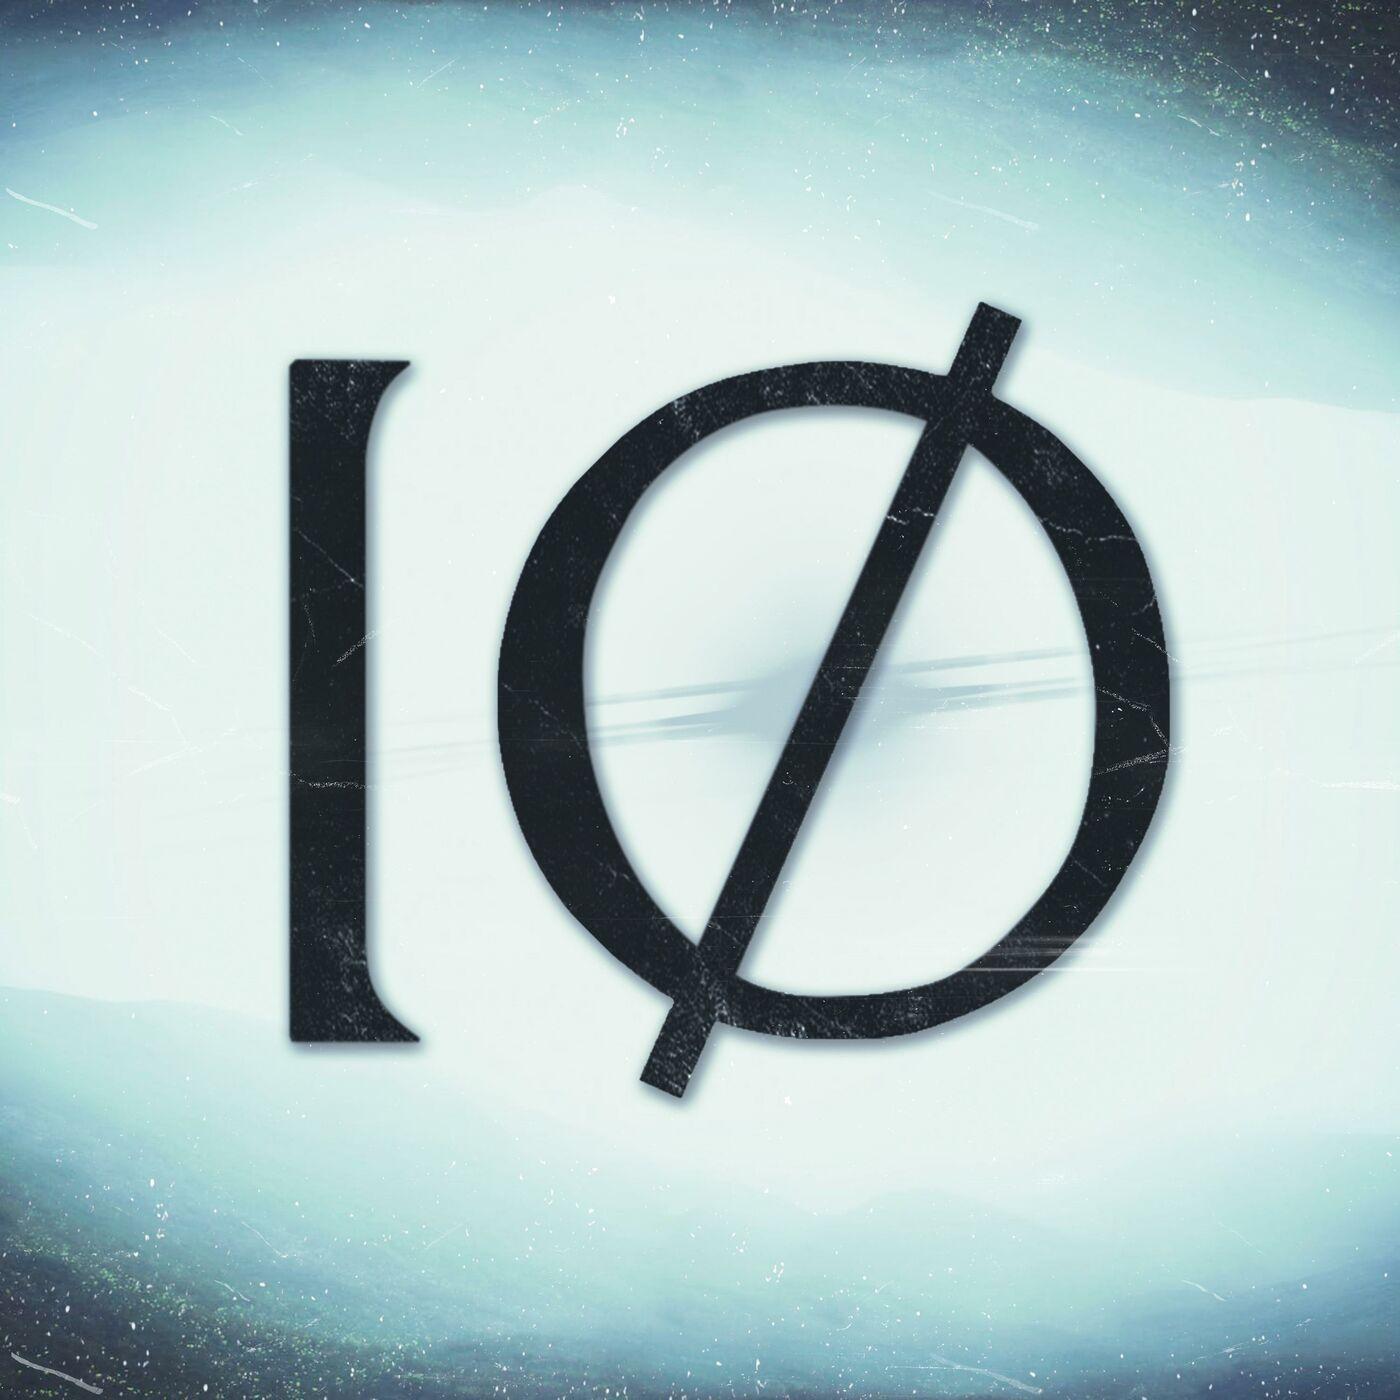 IO - Yeet [single] (2019)